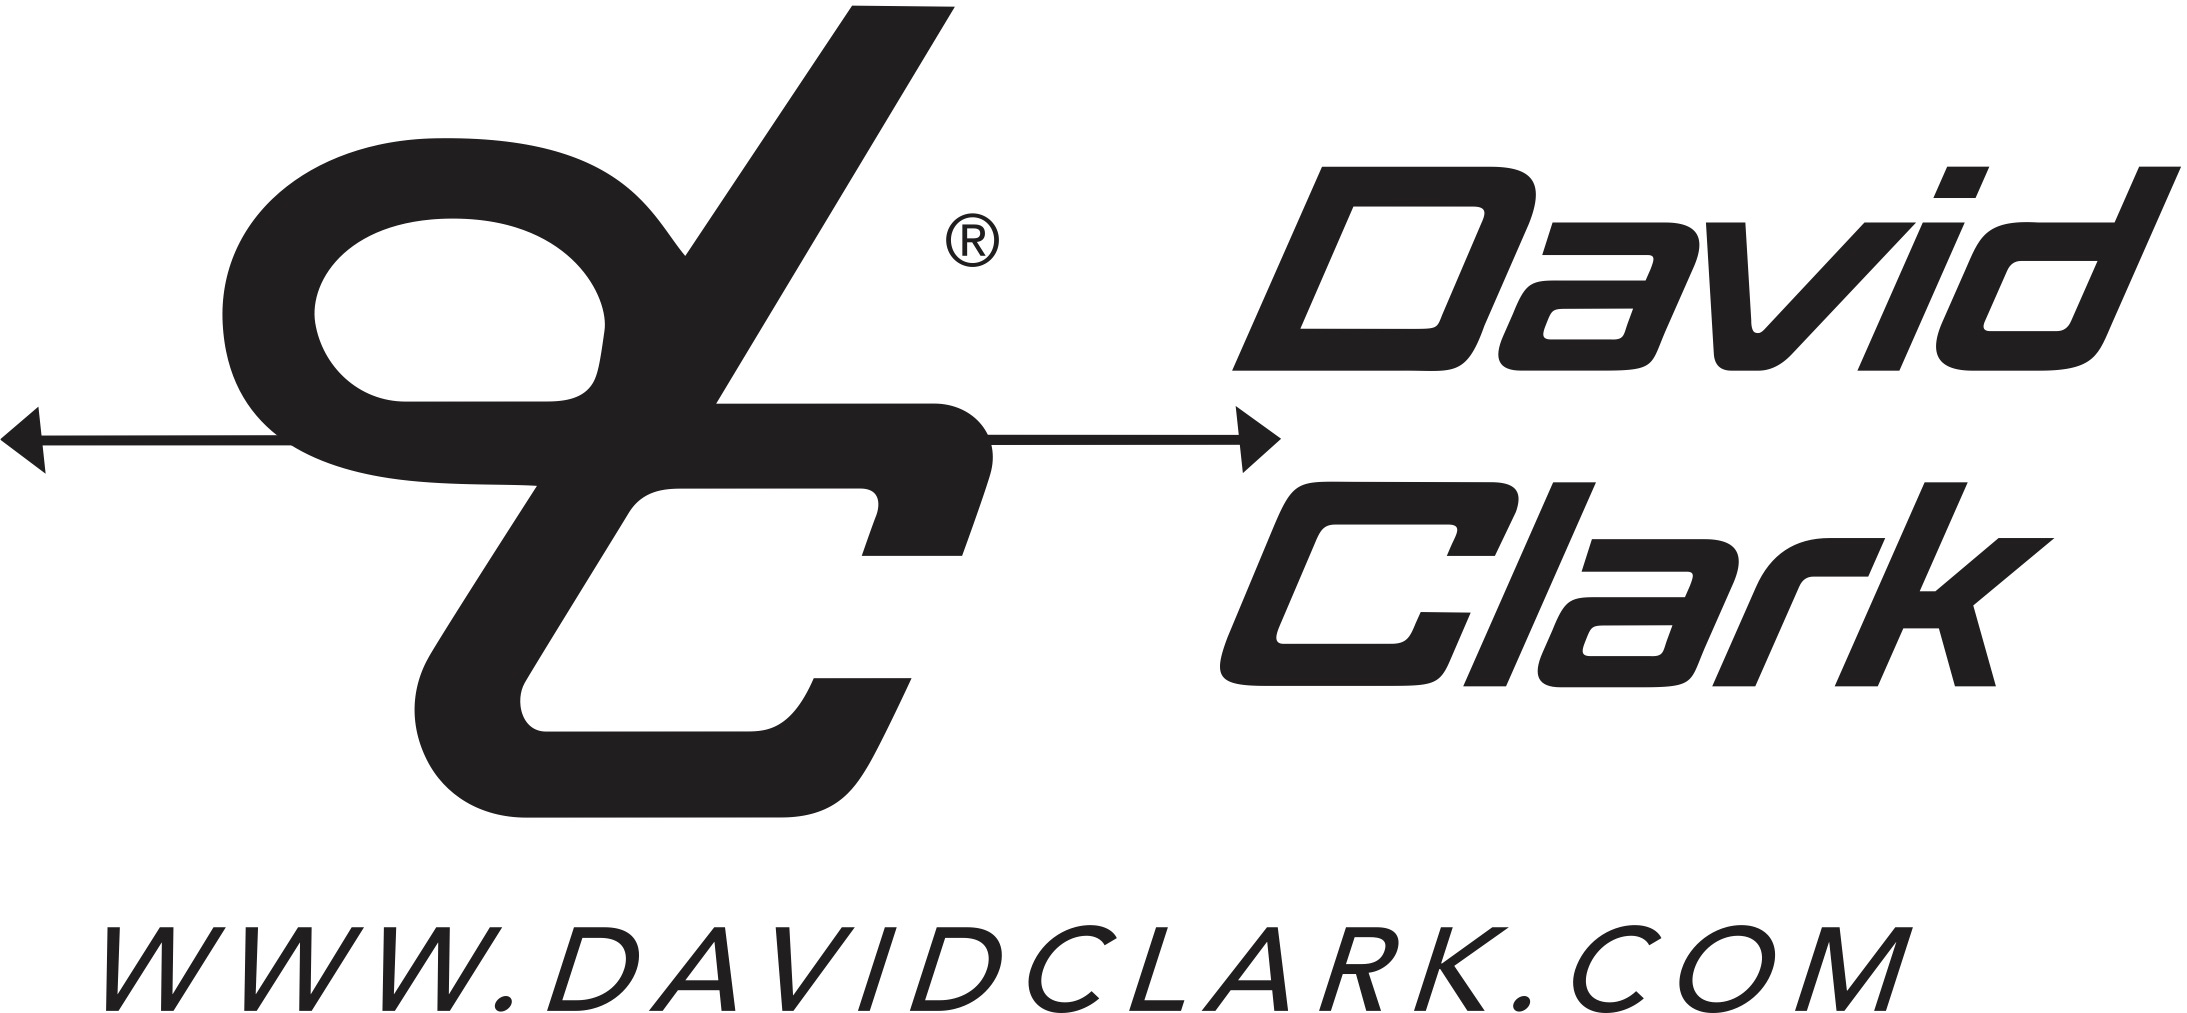 David_Clark_Logo_with_Website.jpg